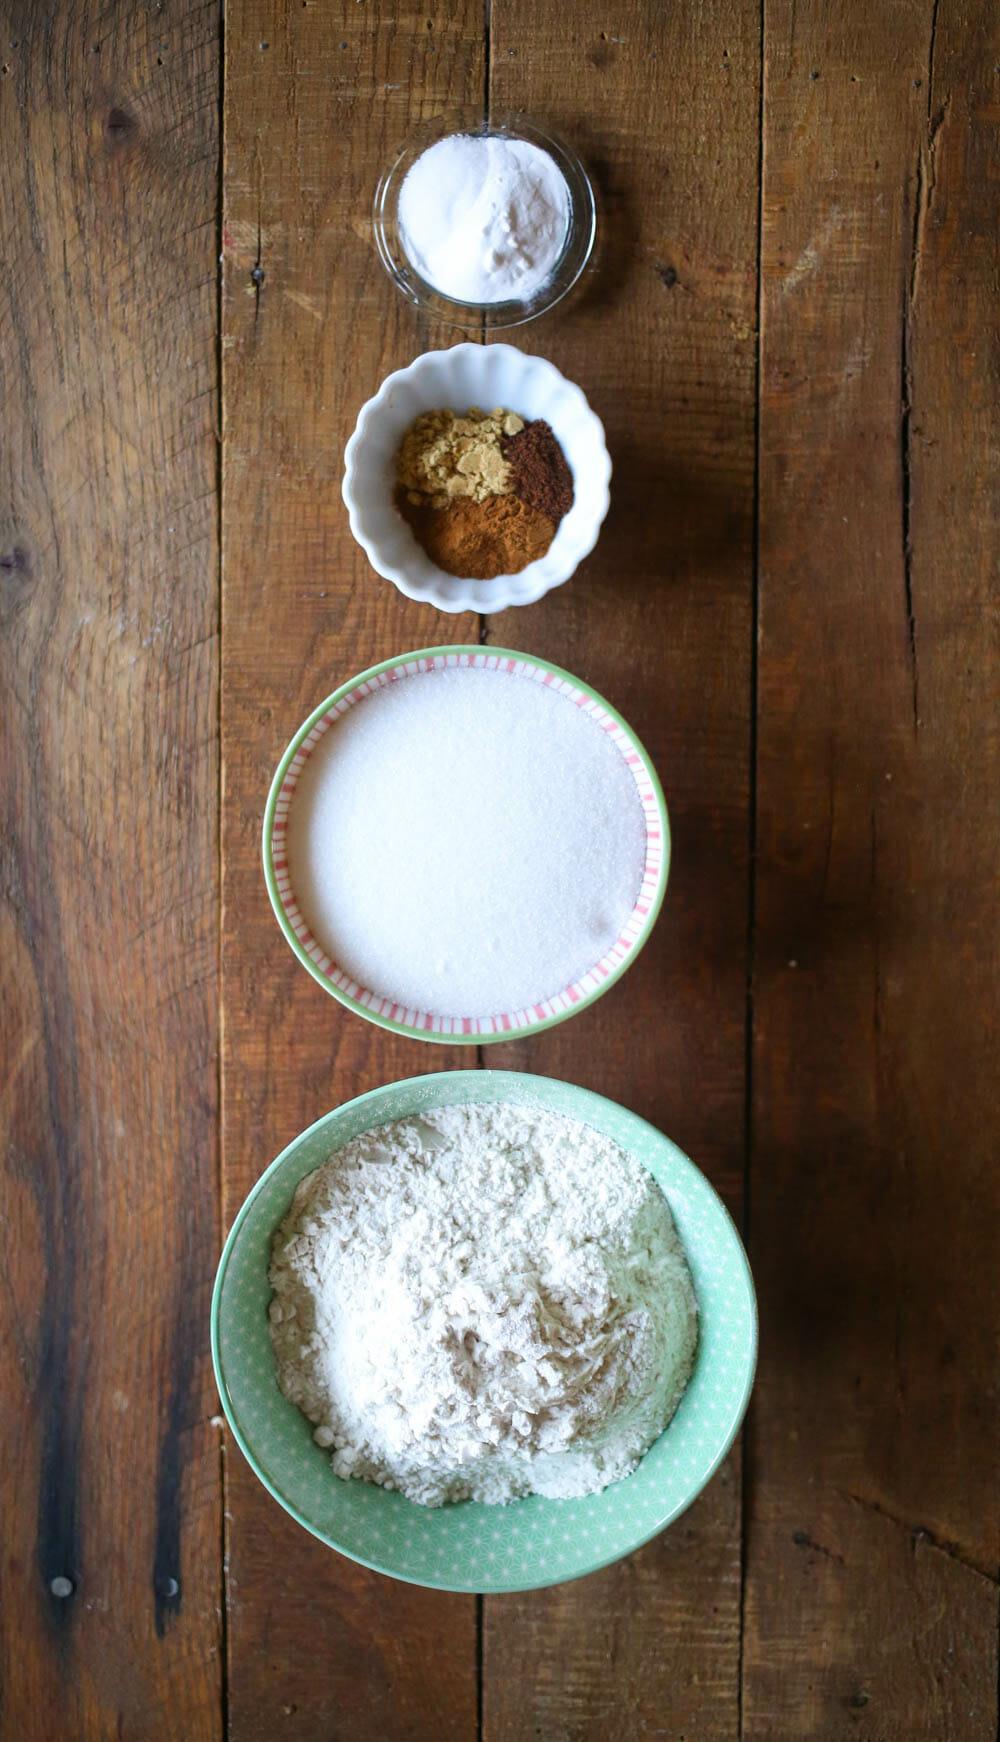 ginger spice cookies dry ingredients